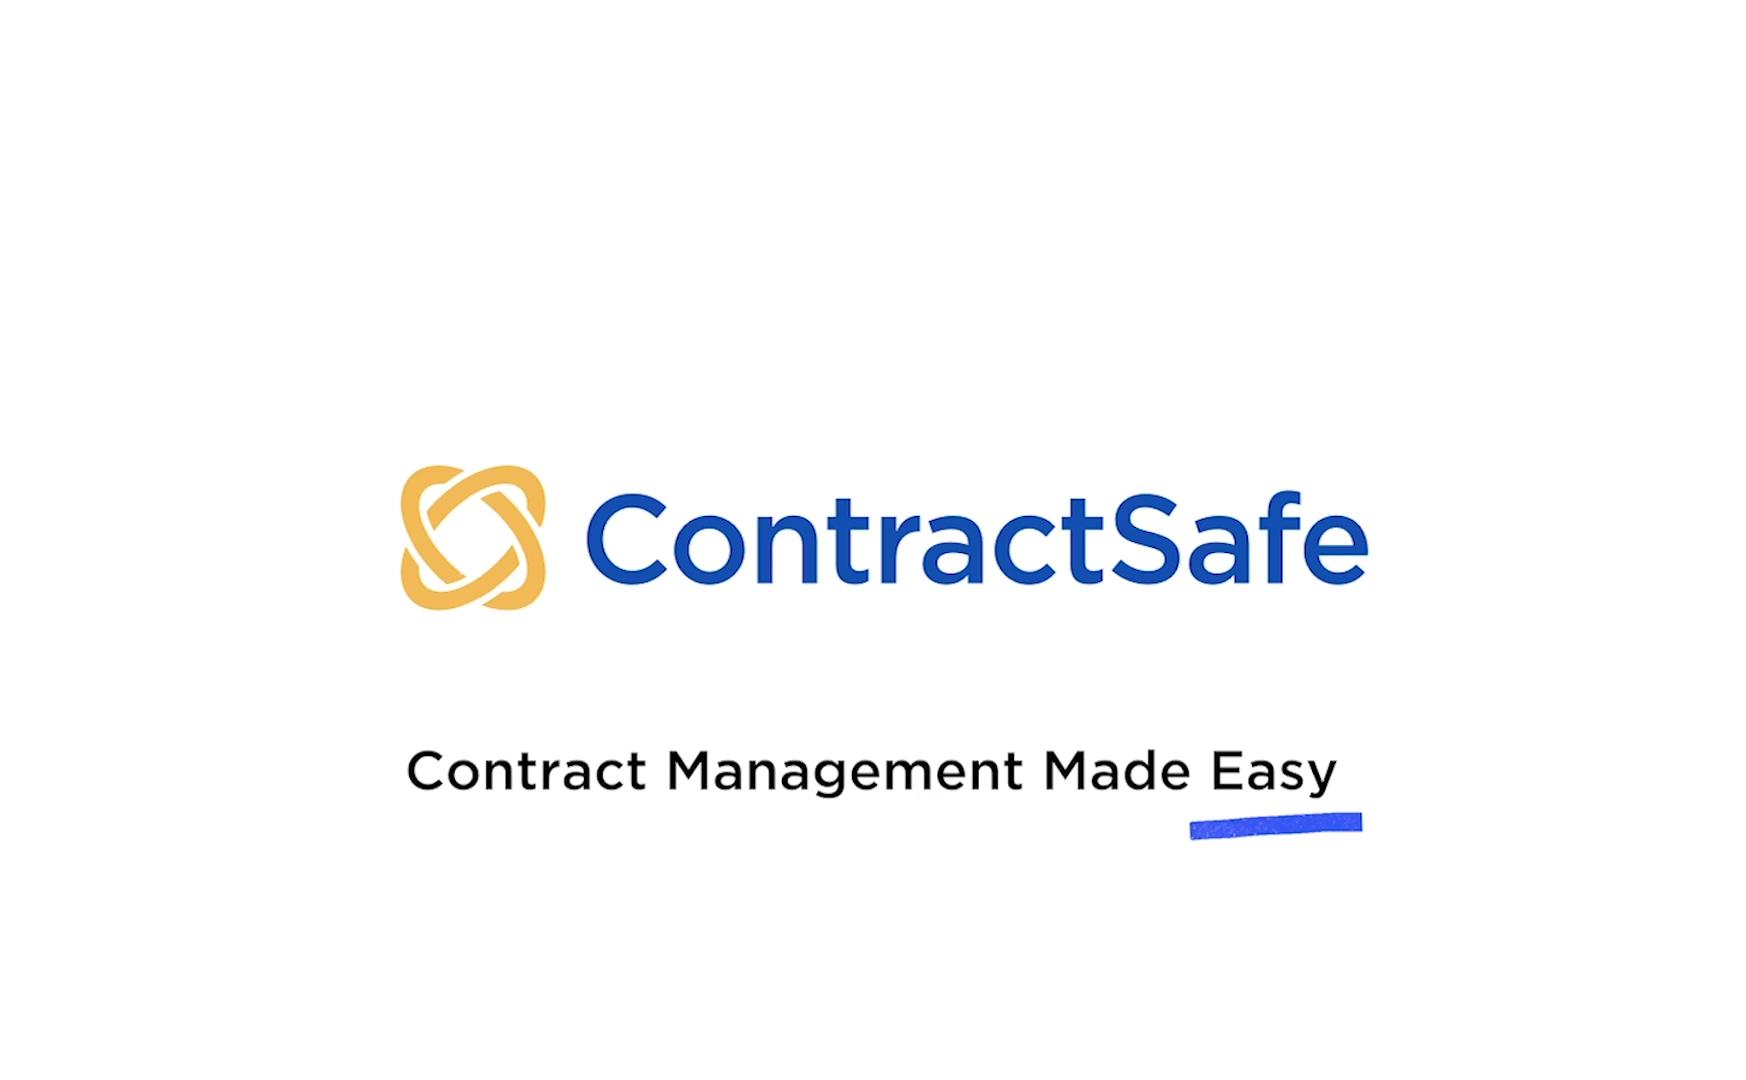 ContractSafe_FINAL_5